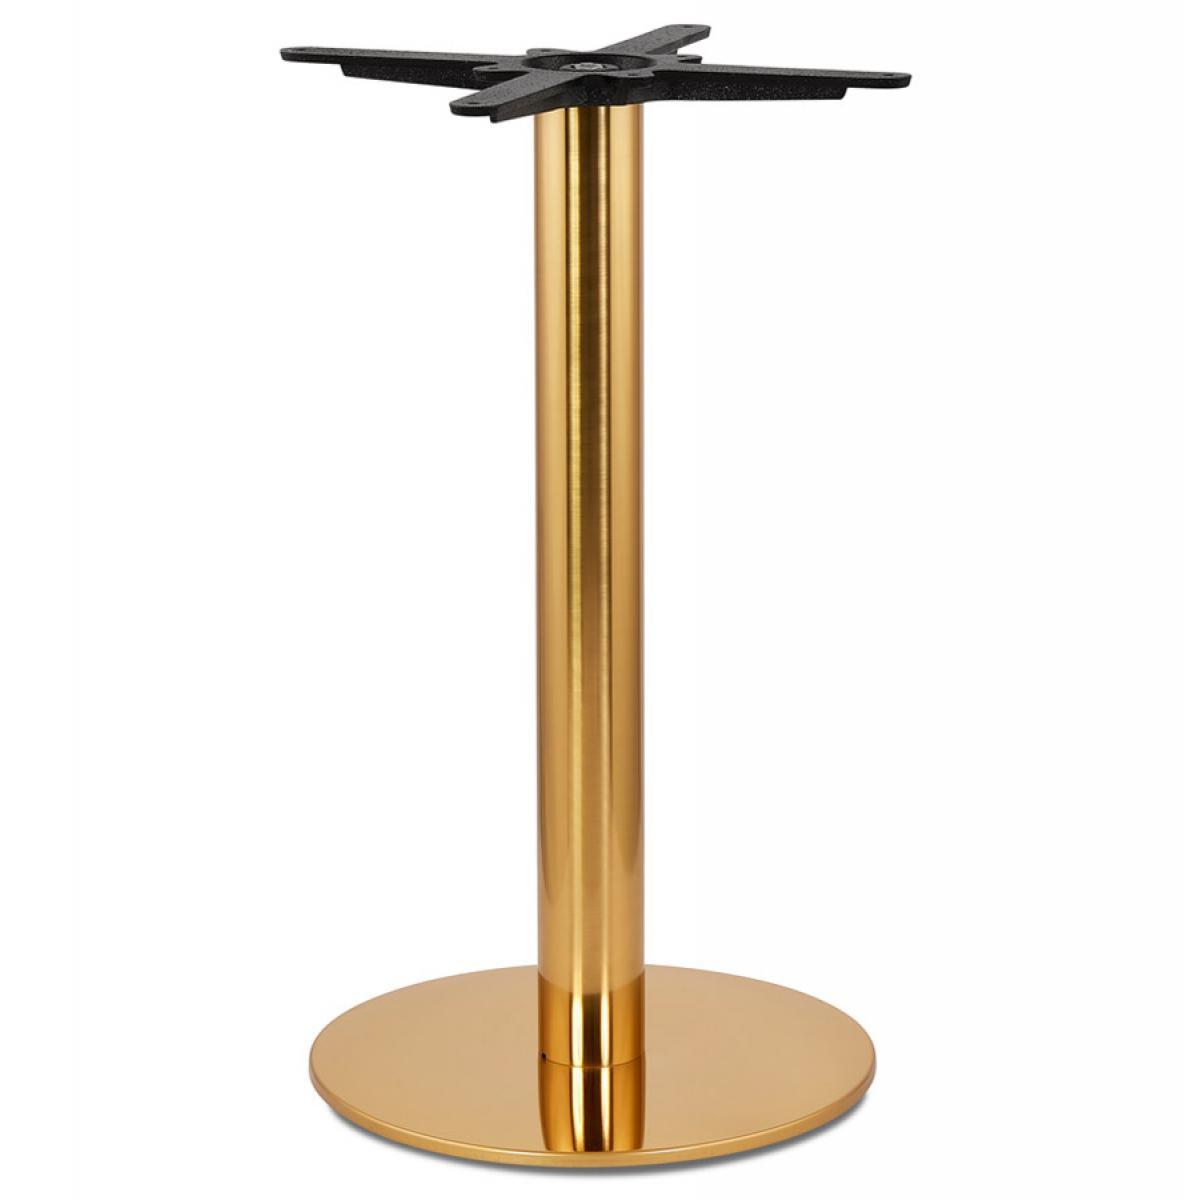 Alterego Pied de table rond 'LIDO' 75 en métal doré